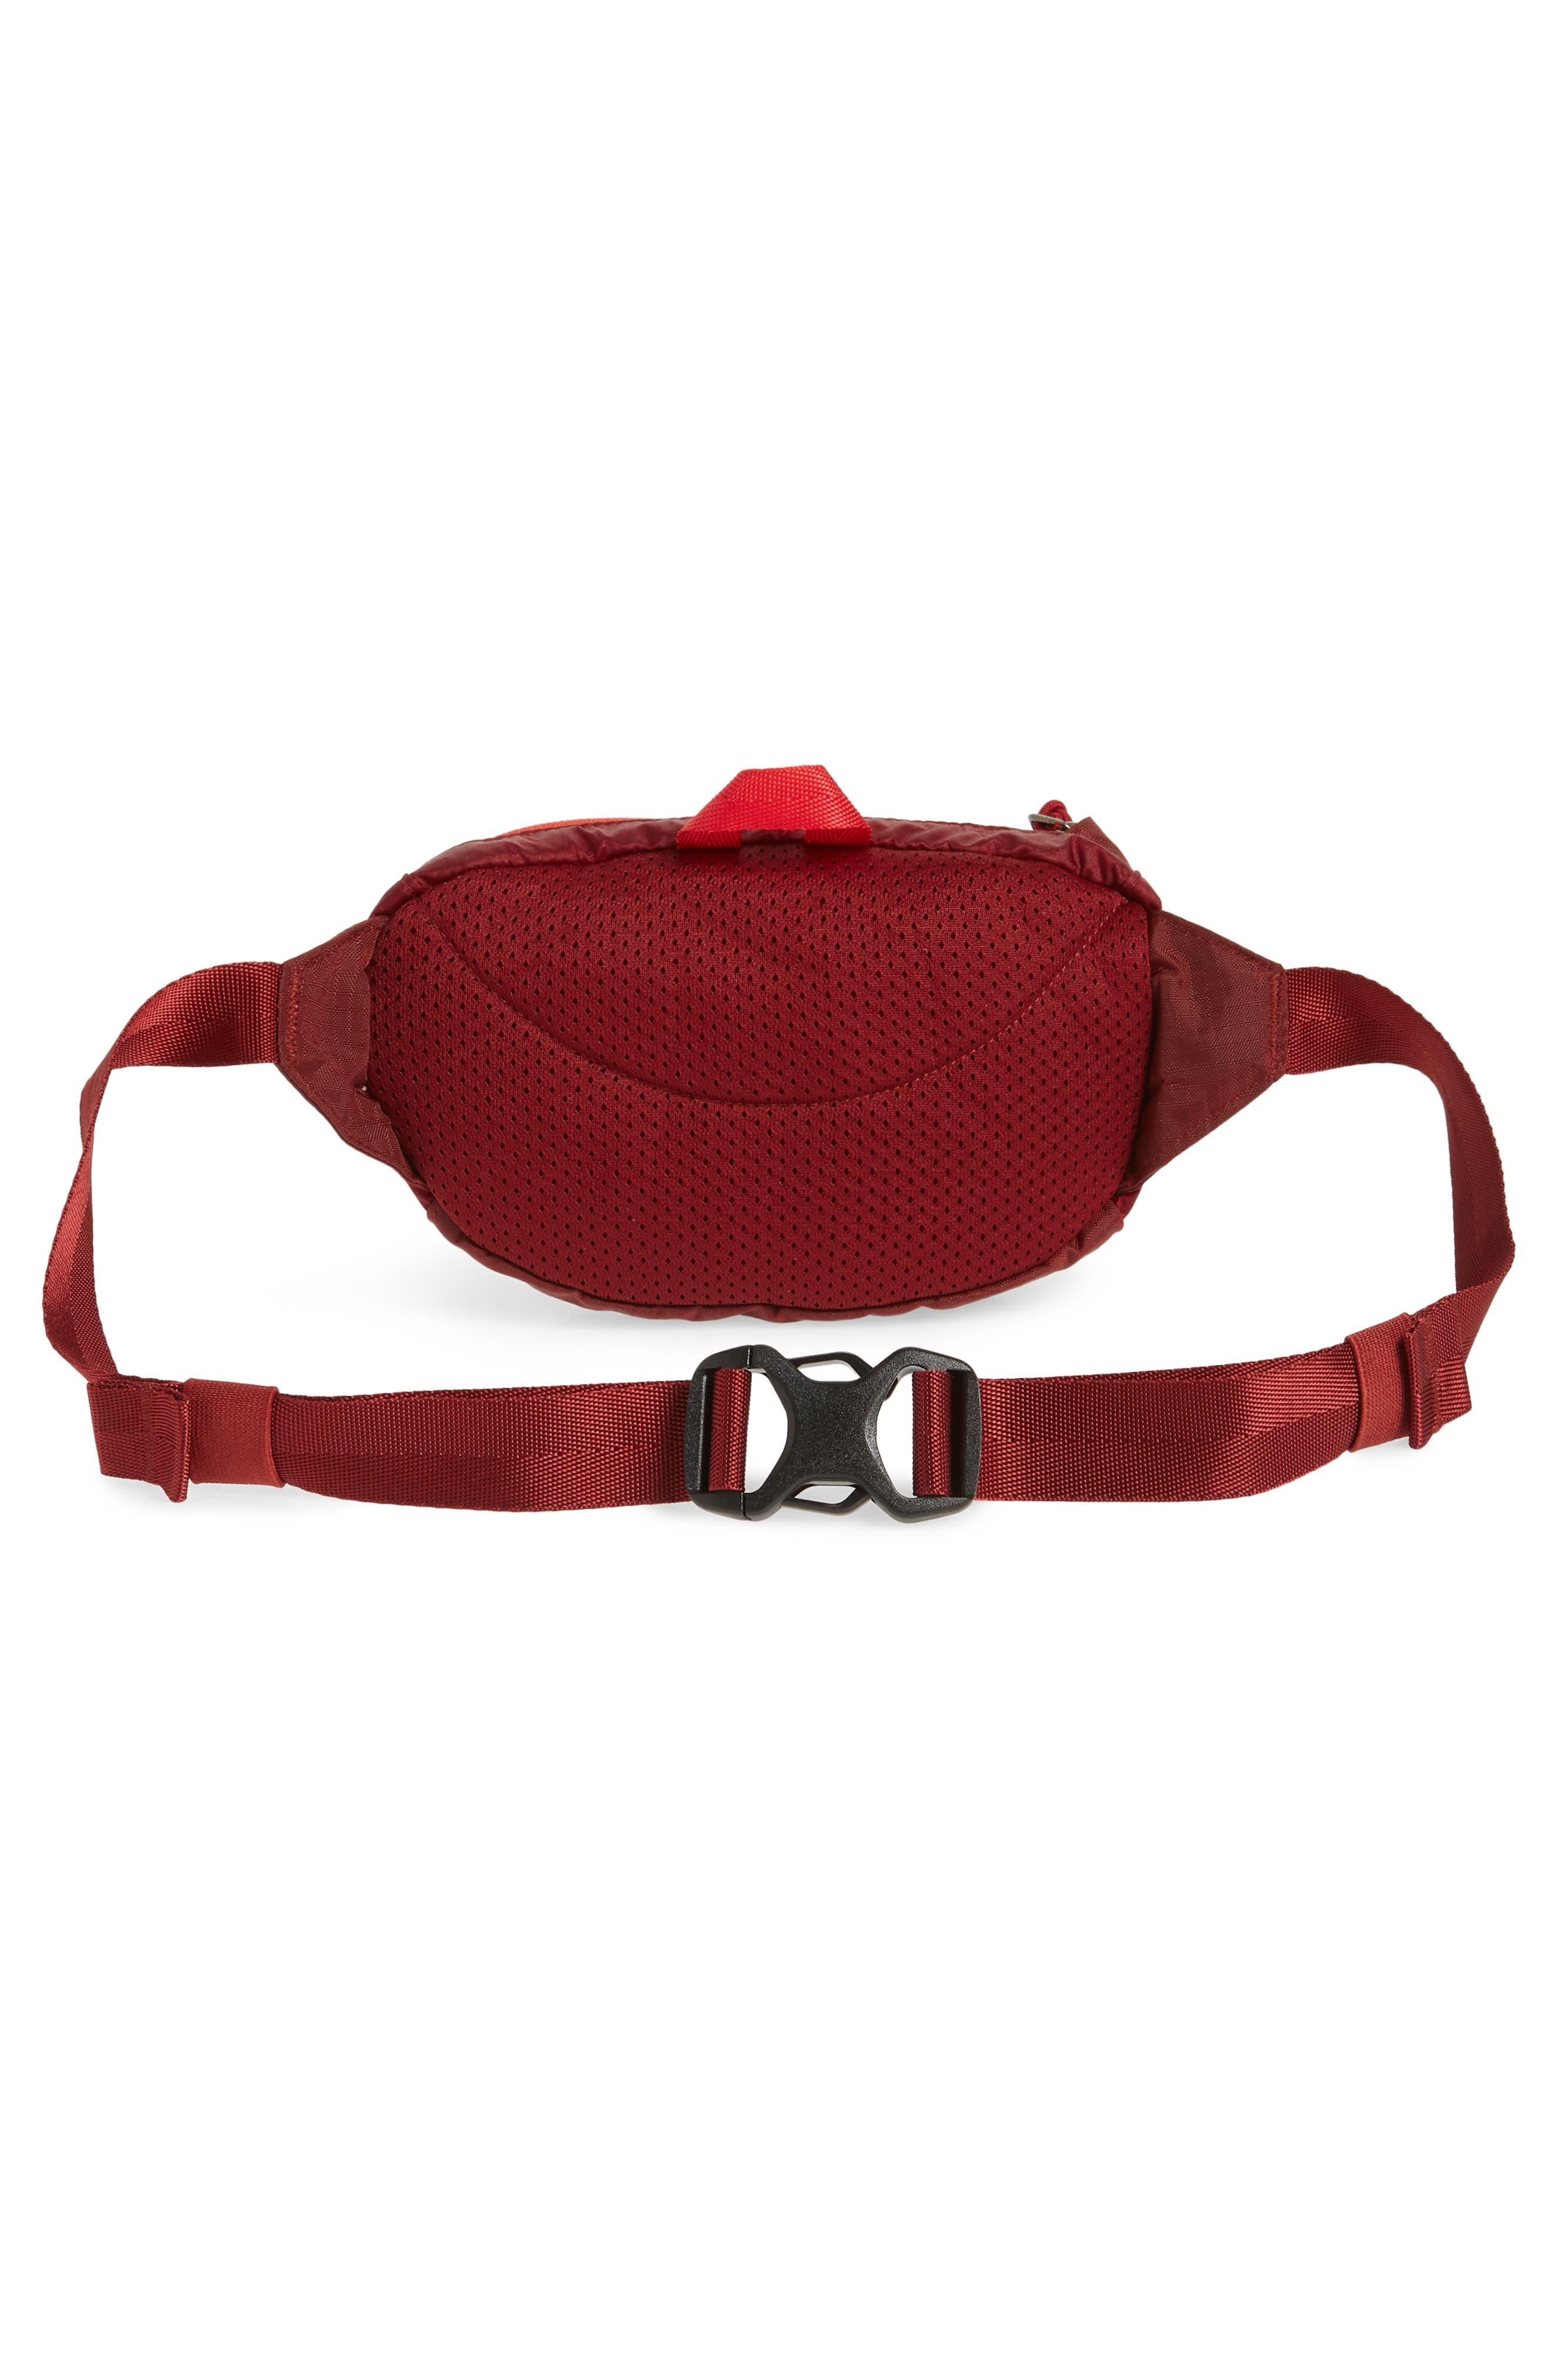 Travel Belt Bag,                             Alternate thumbnail 20, color,